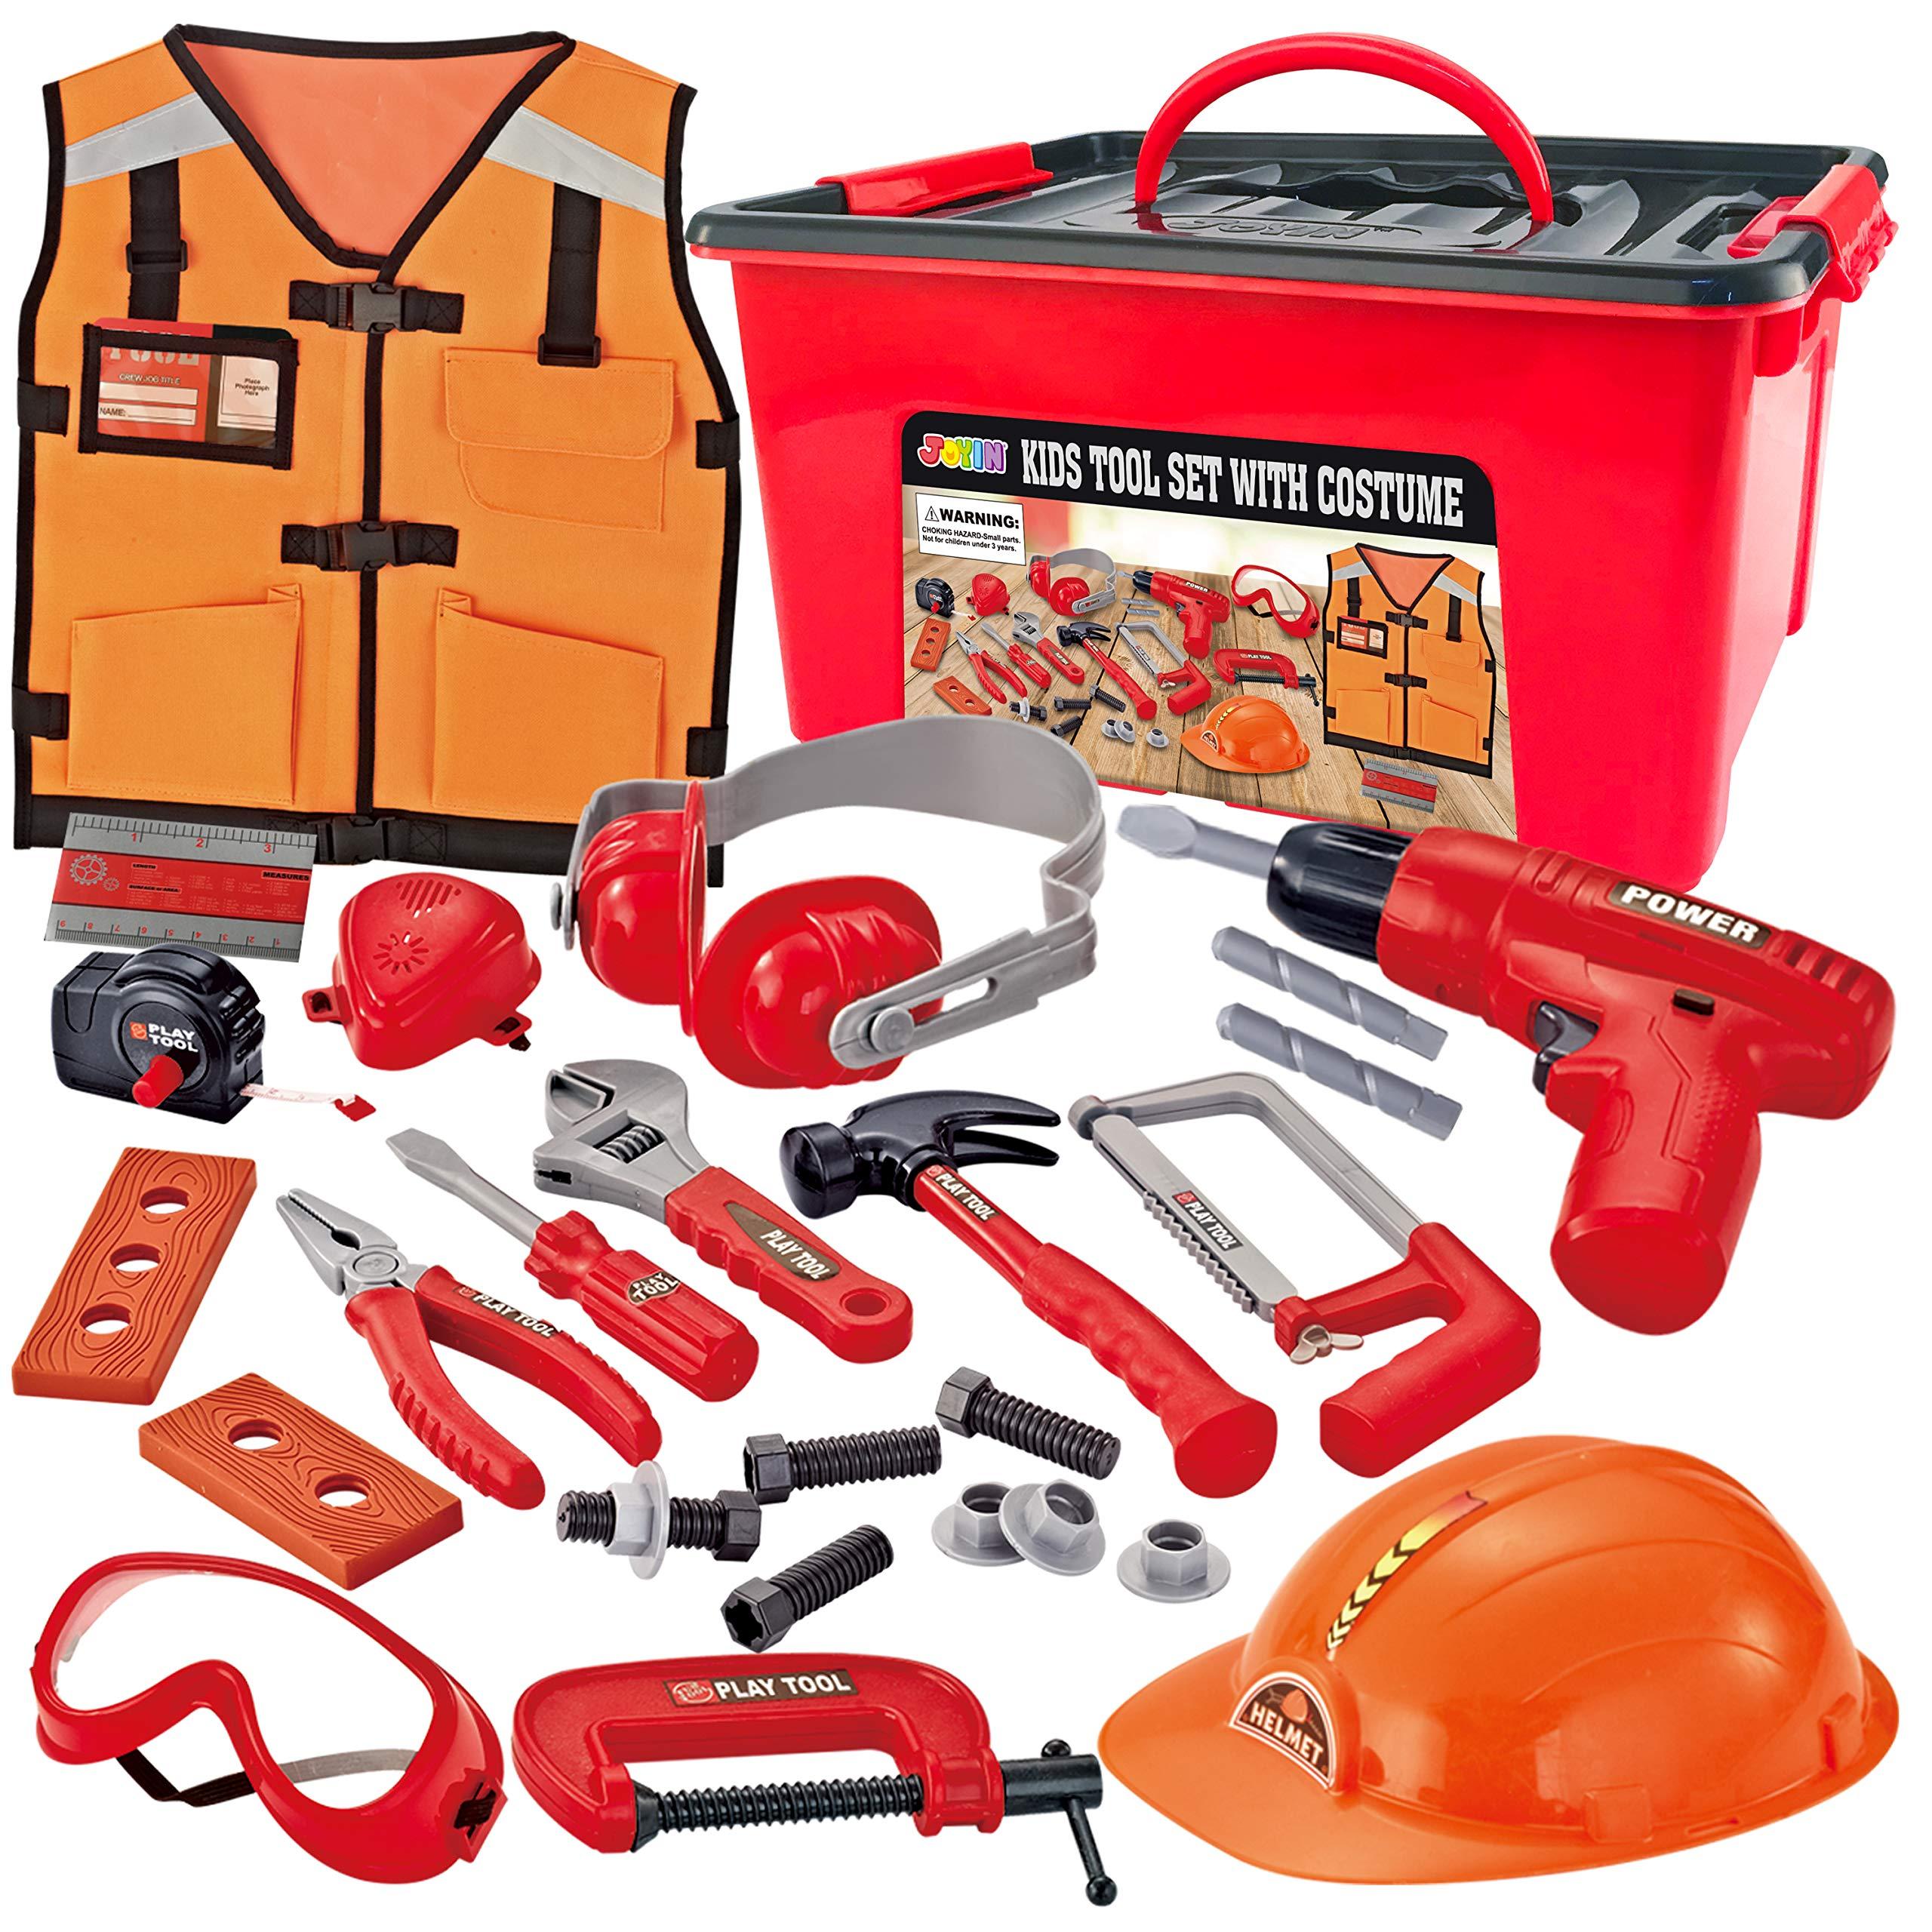 JOYIN Construction Accessories Including Electric